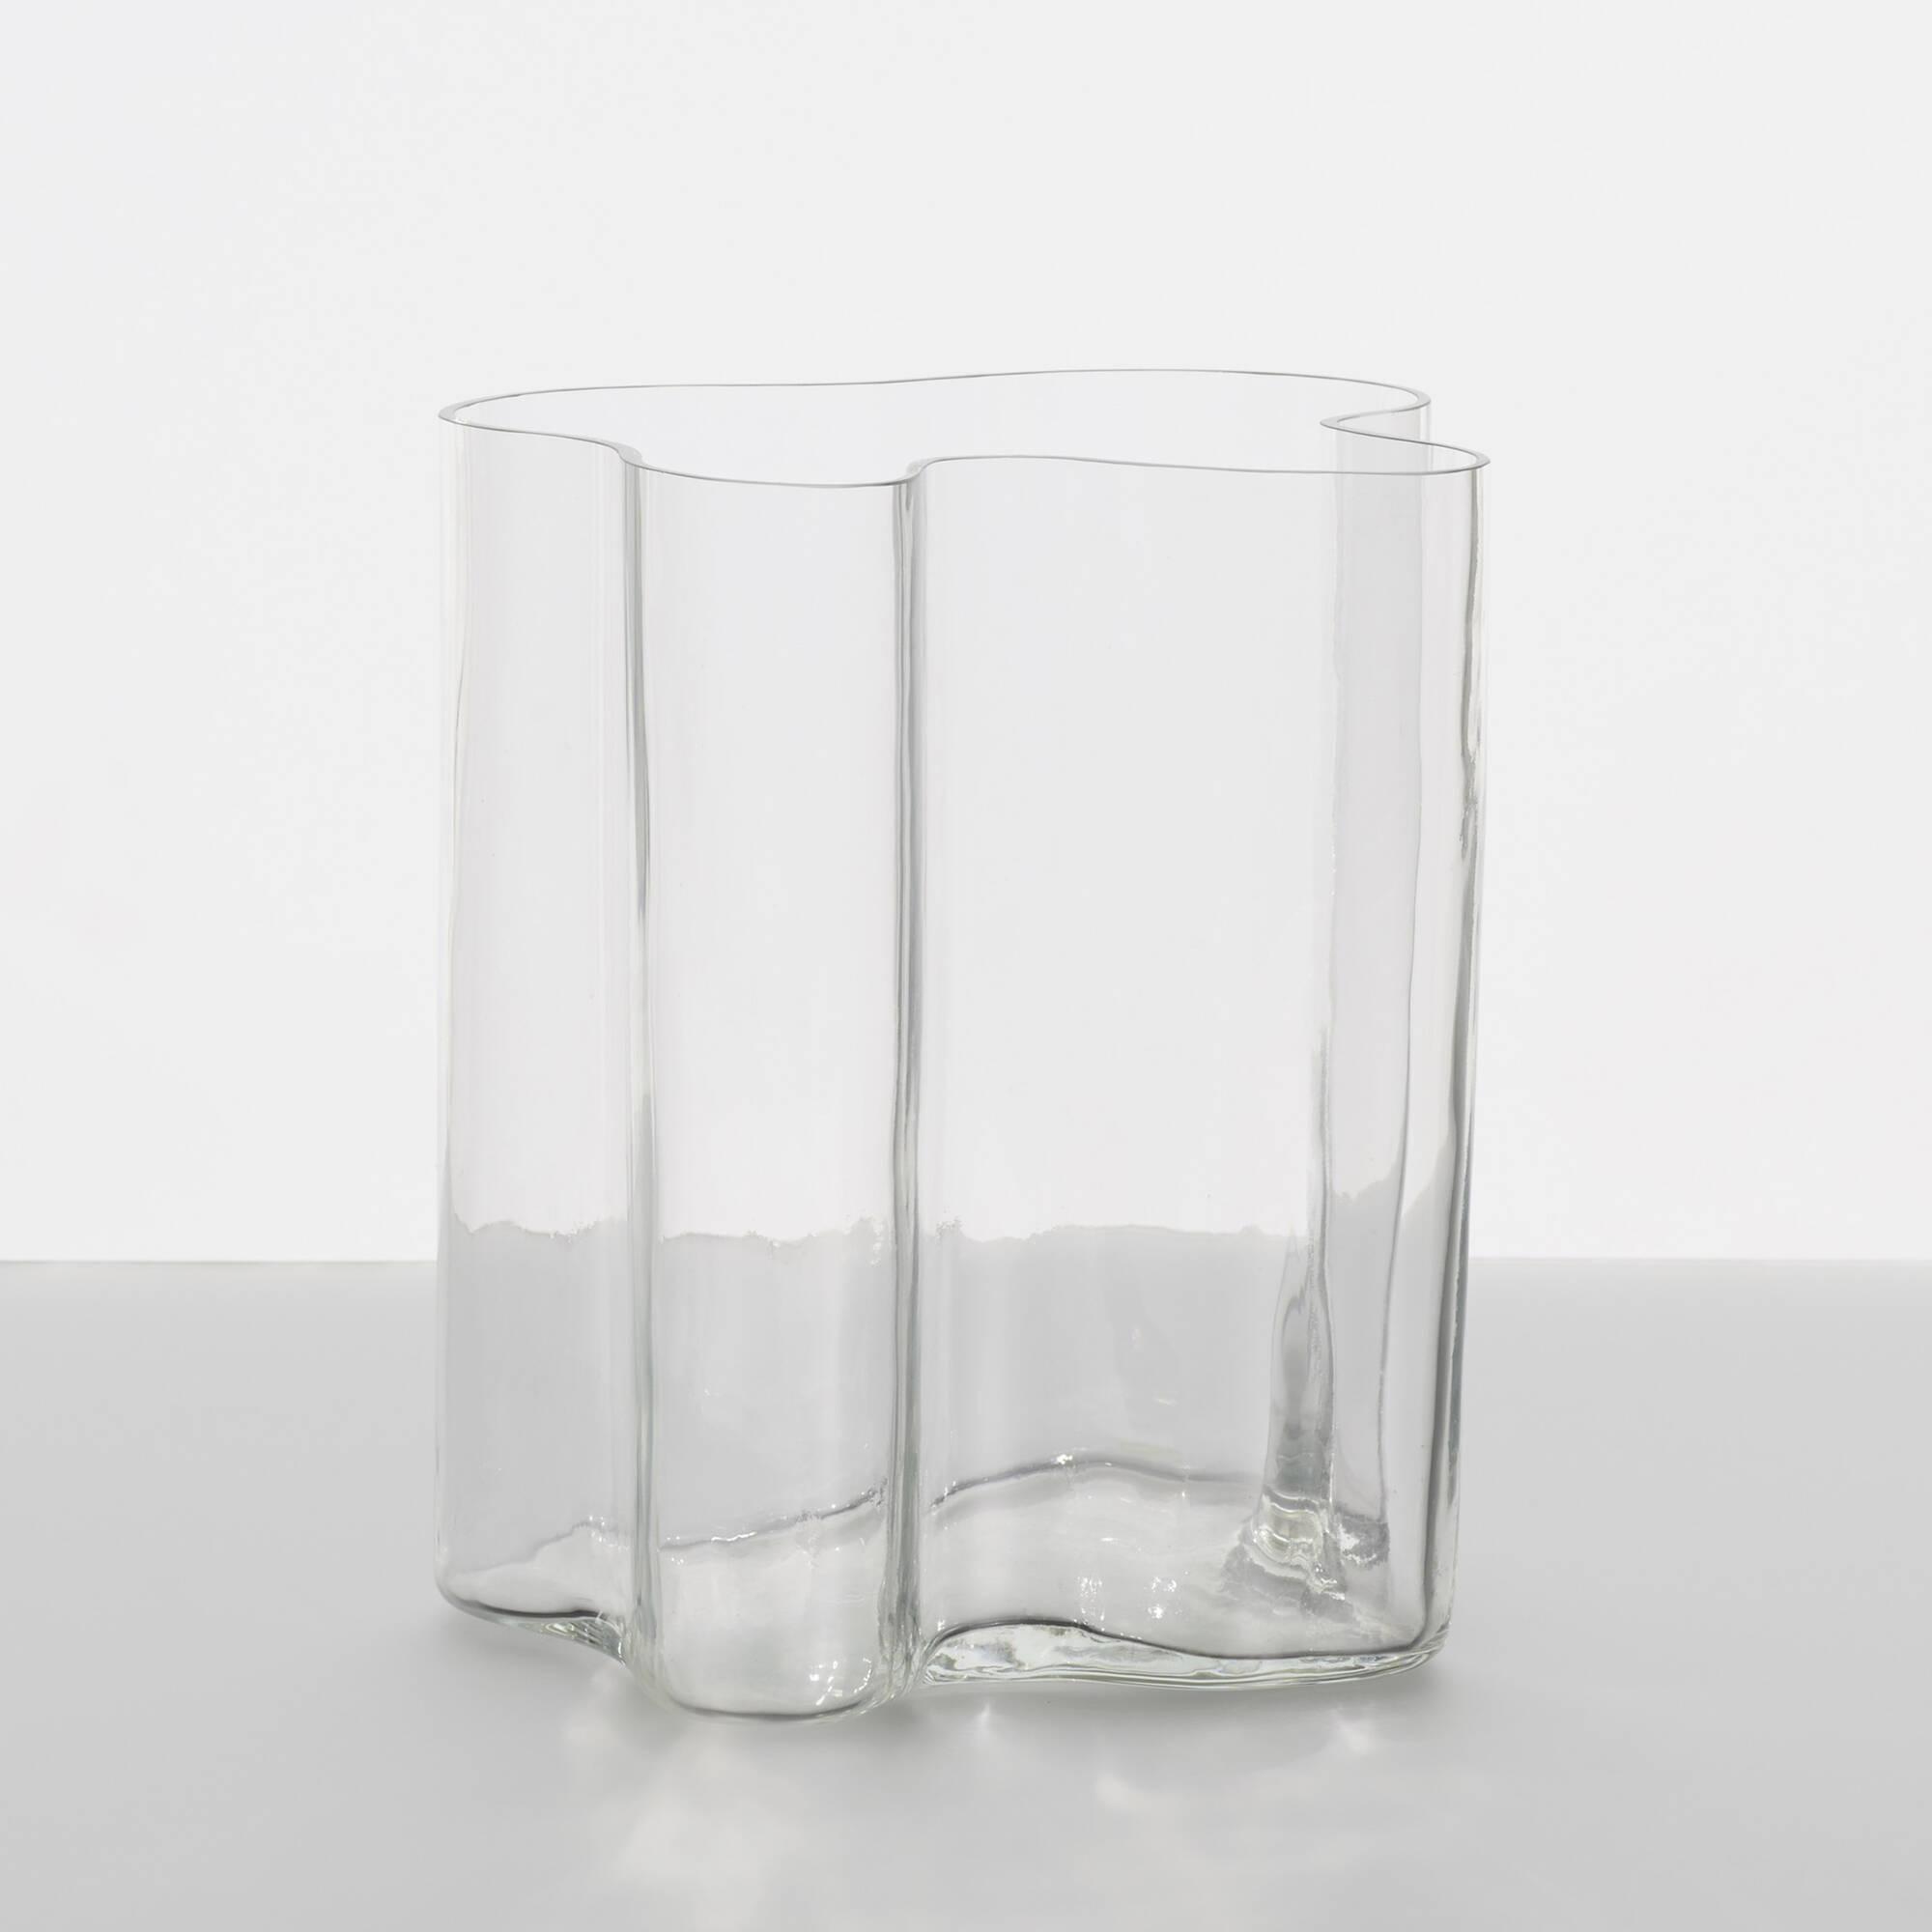 161: Alvar Aalto / Savoy vase (2 of 2)